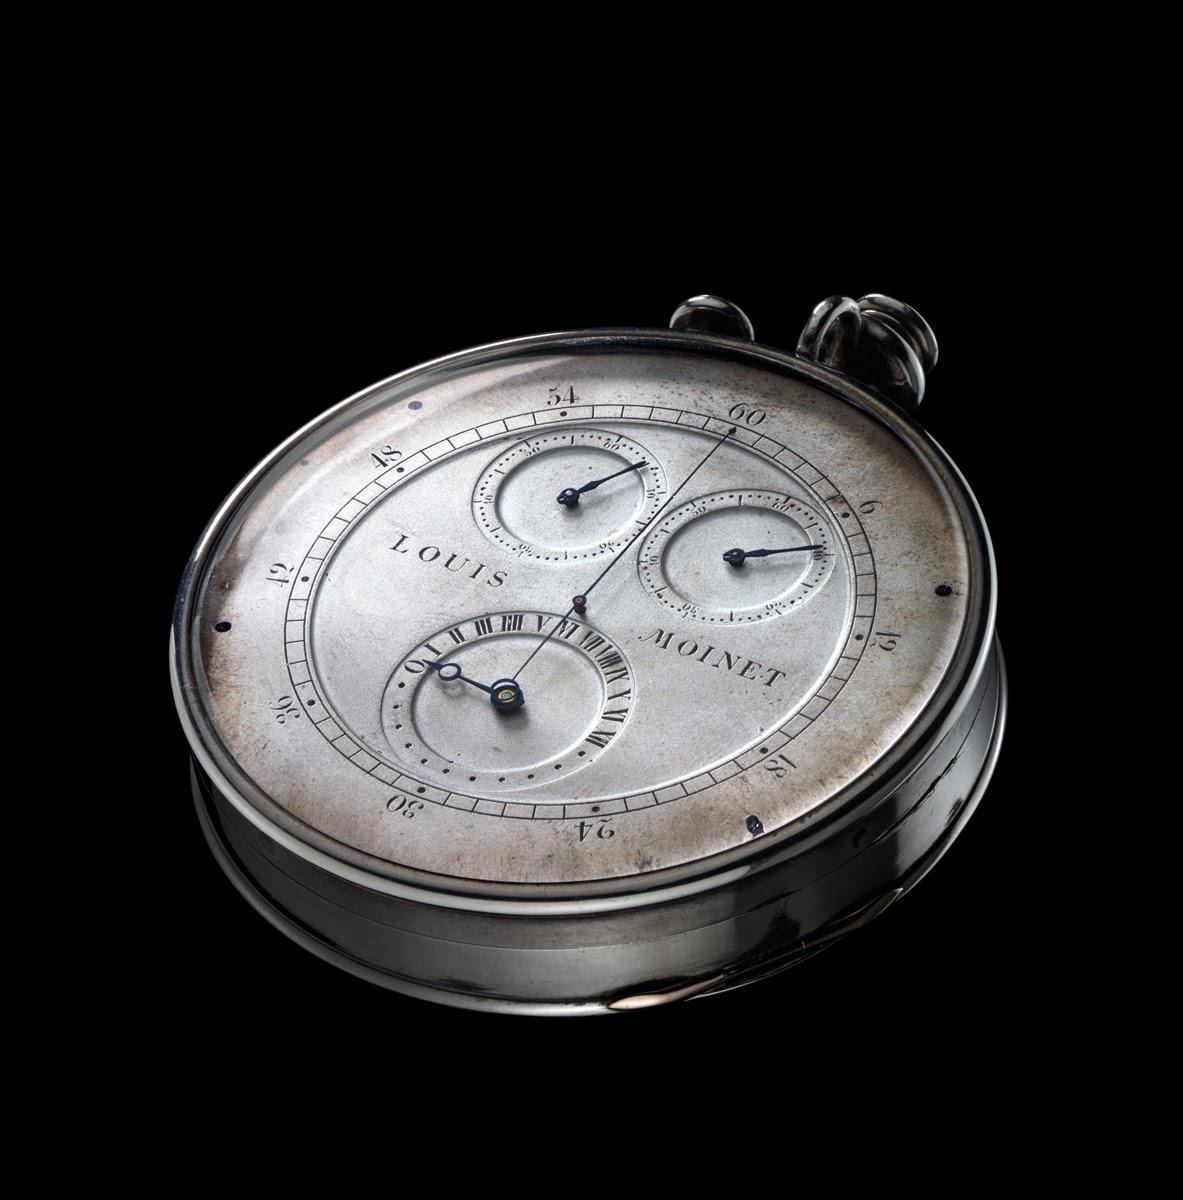 Louis Louis Moinet debajo del reloj8